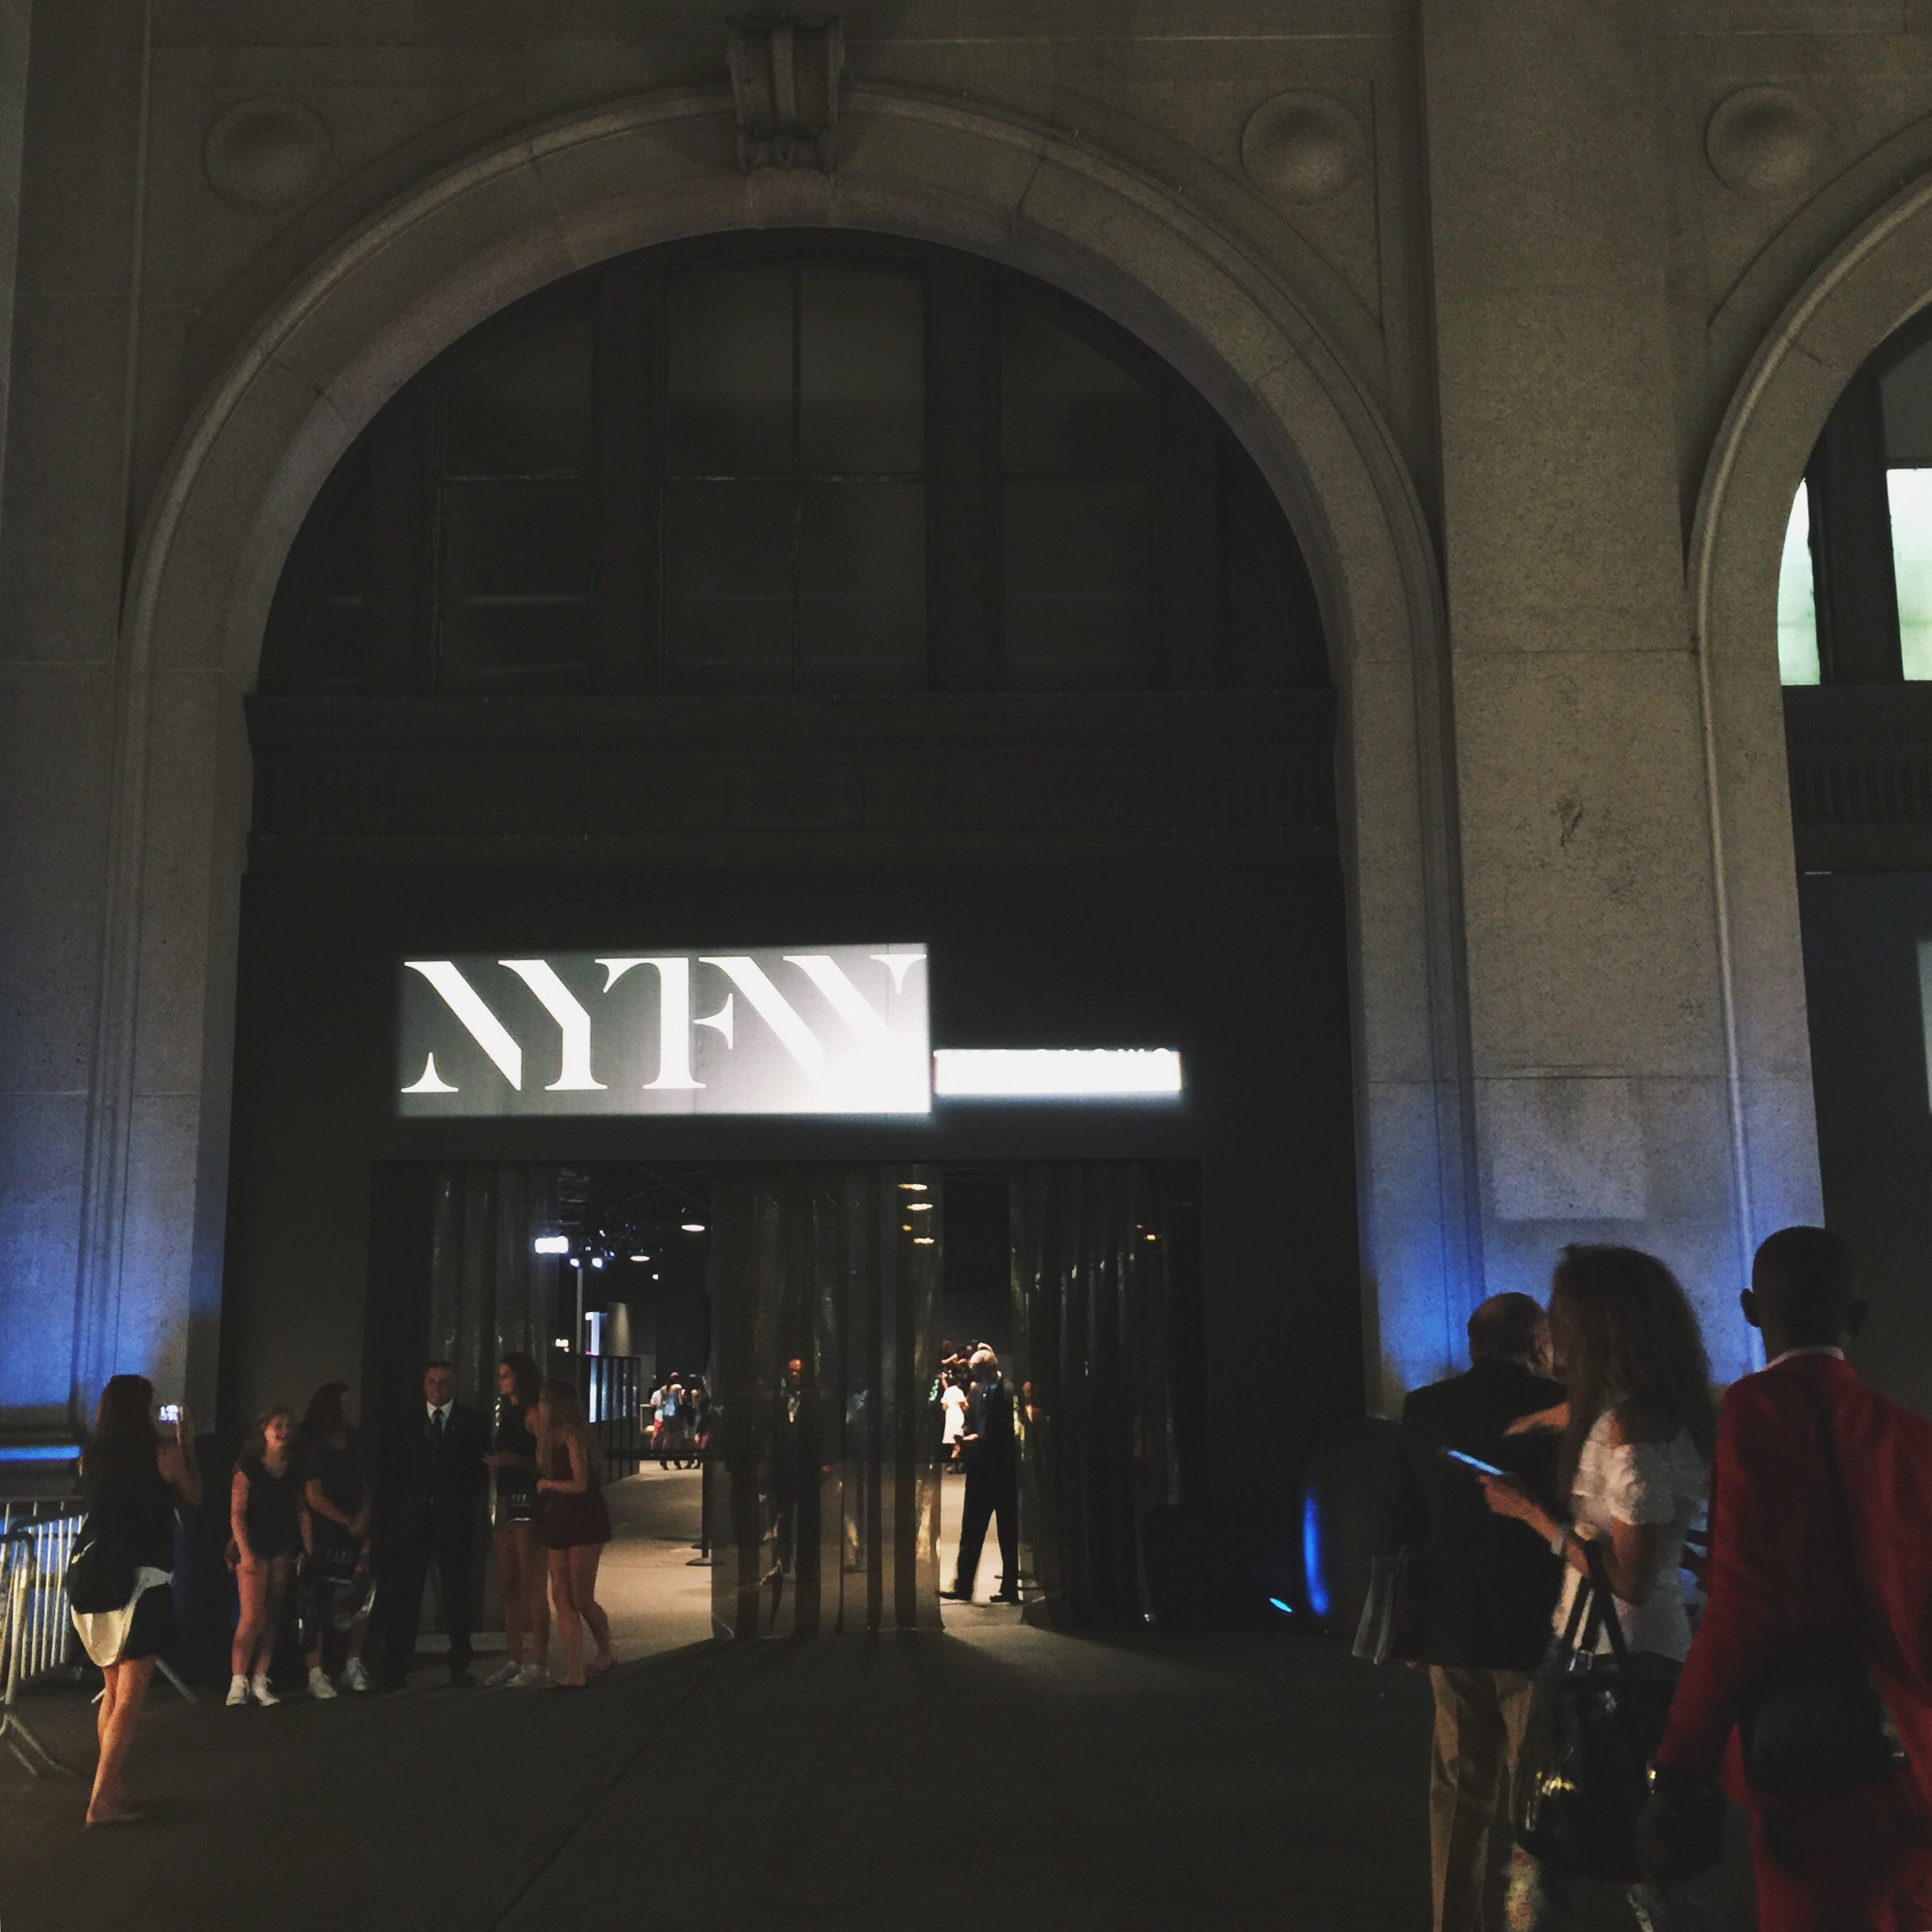 It's been fun NYFW!